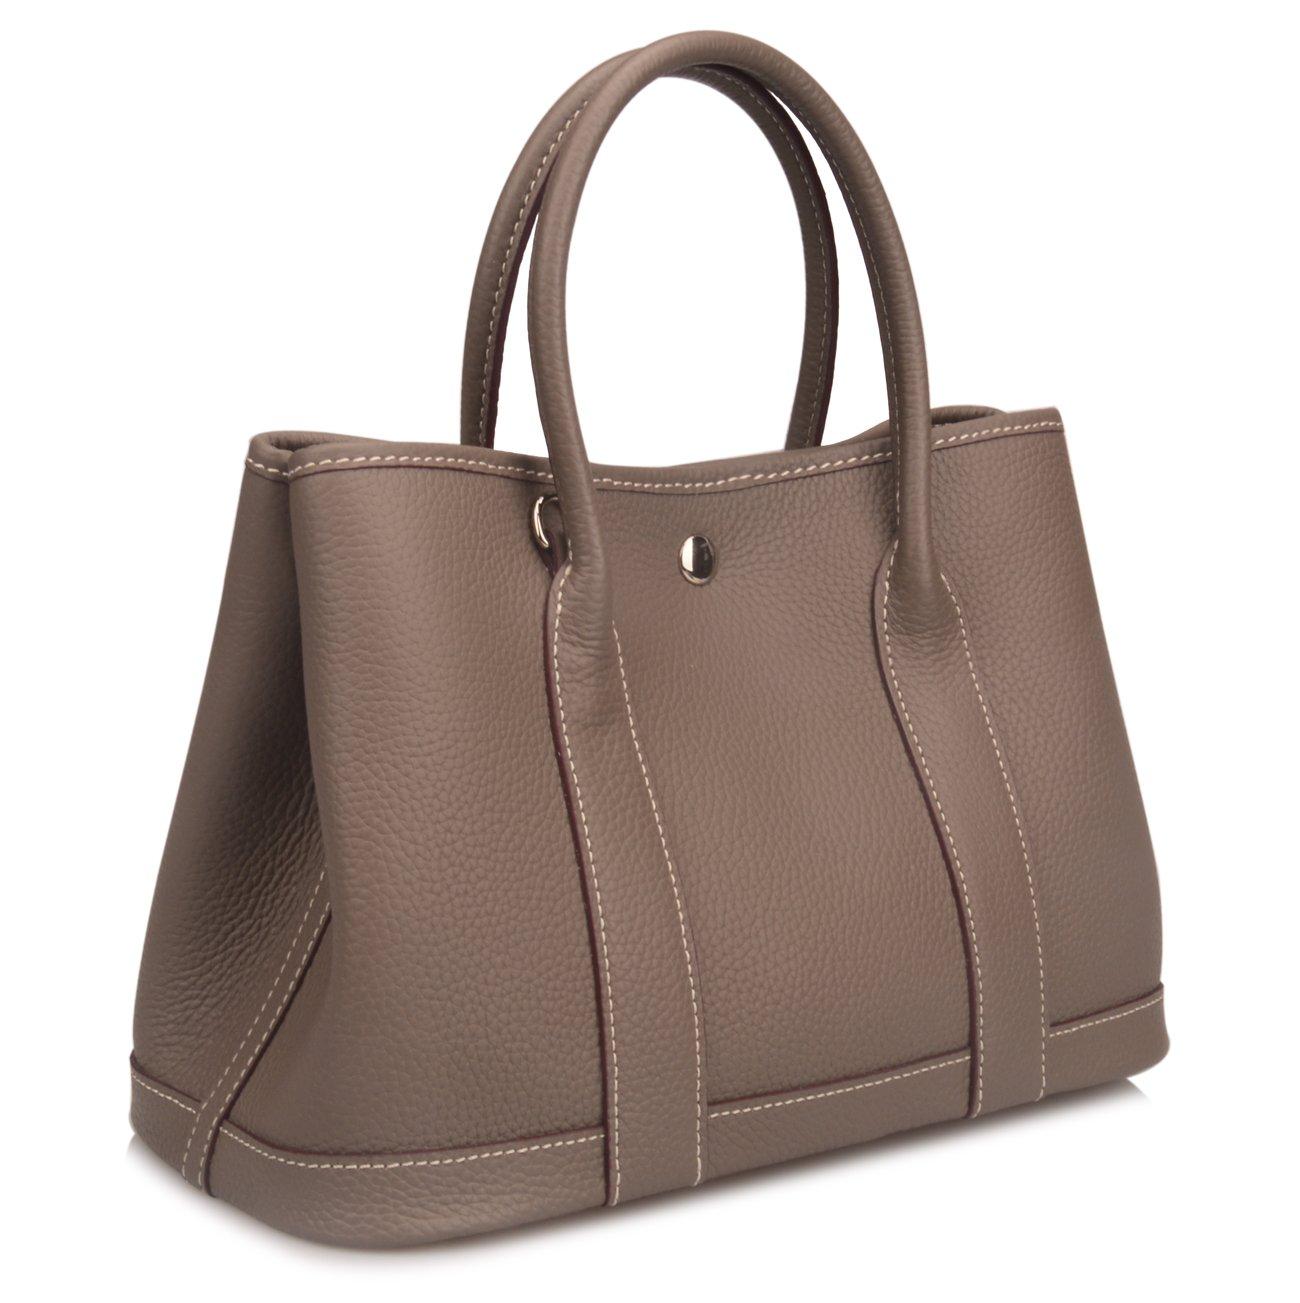 Qidell Women's Genuine Leather Tote Bag Top Handle Handbags (Small, Dark grey)